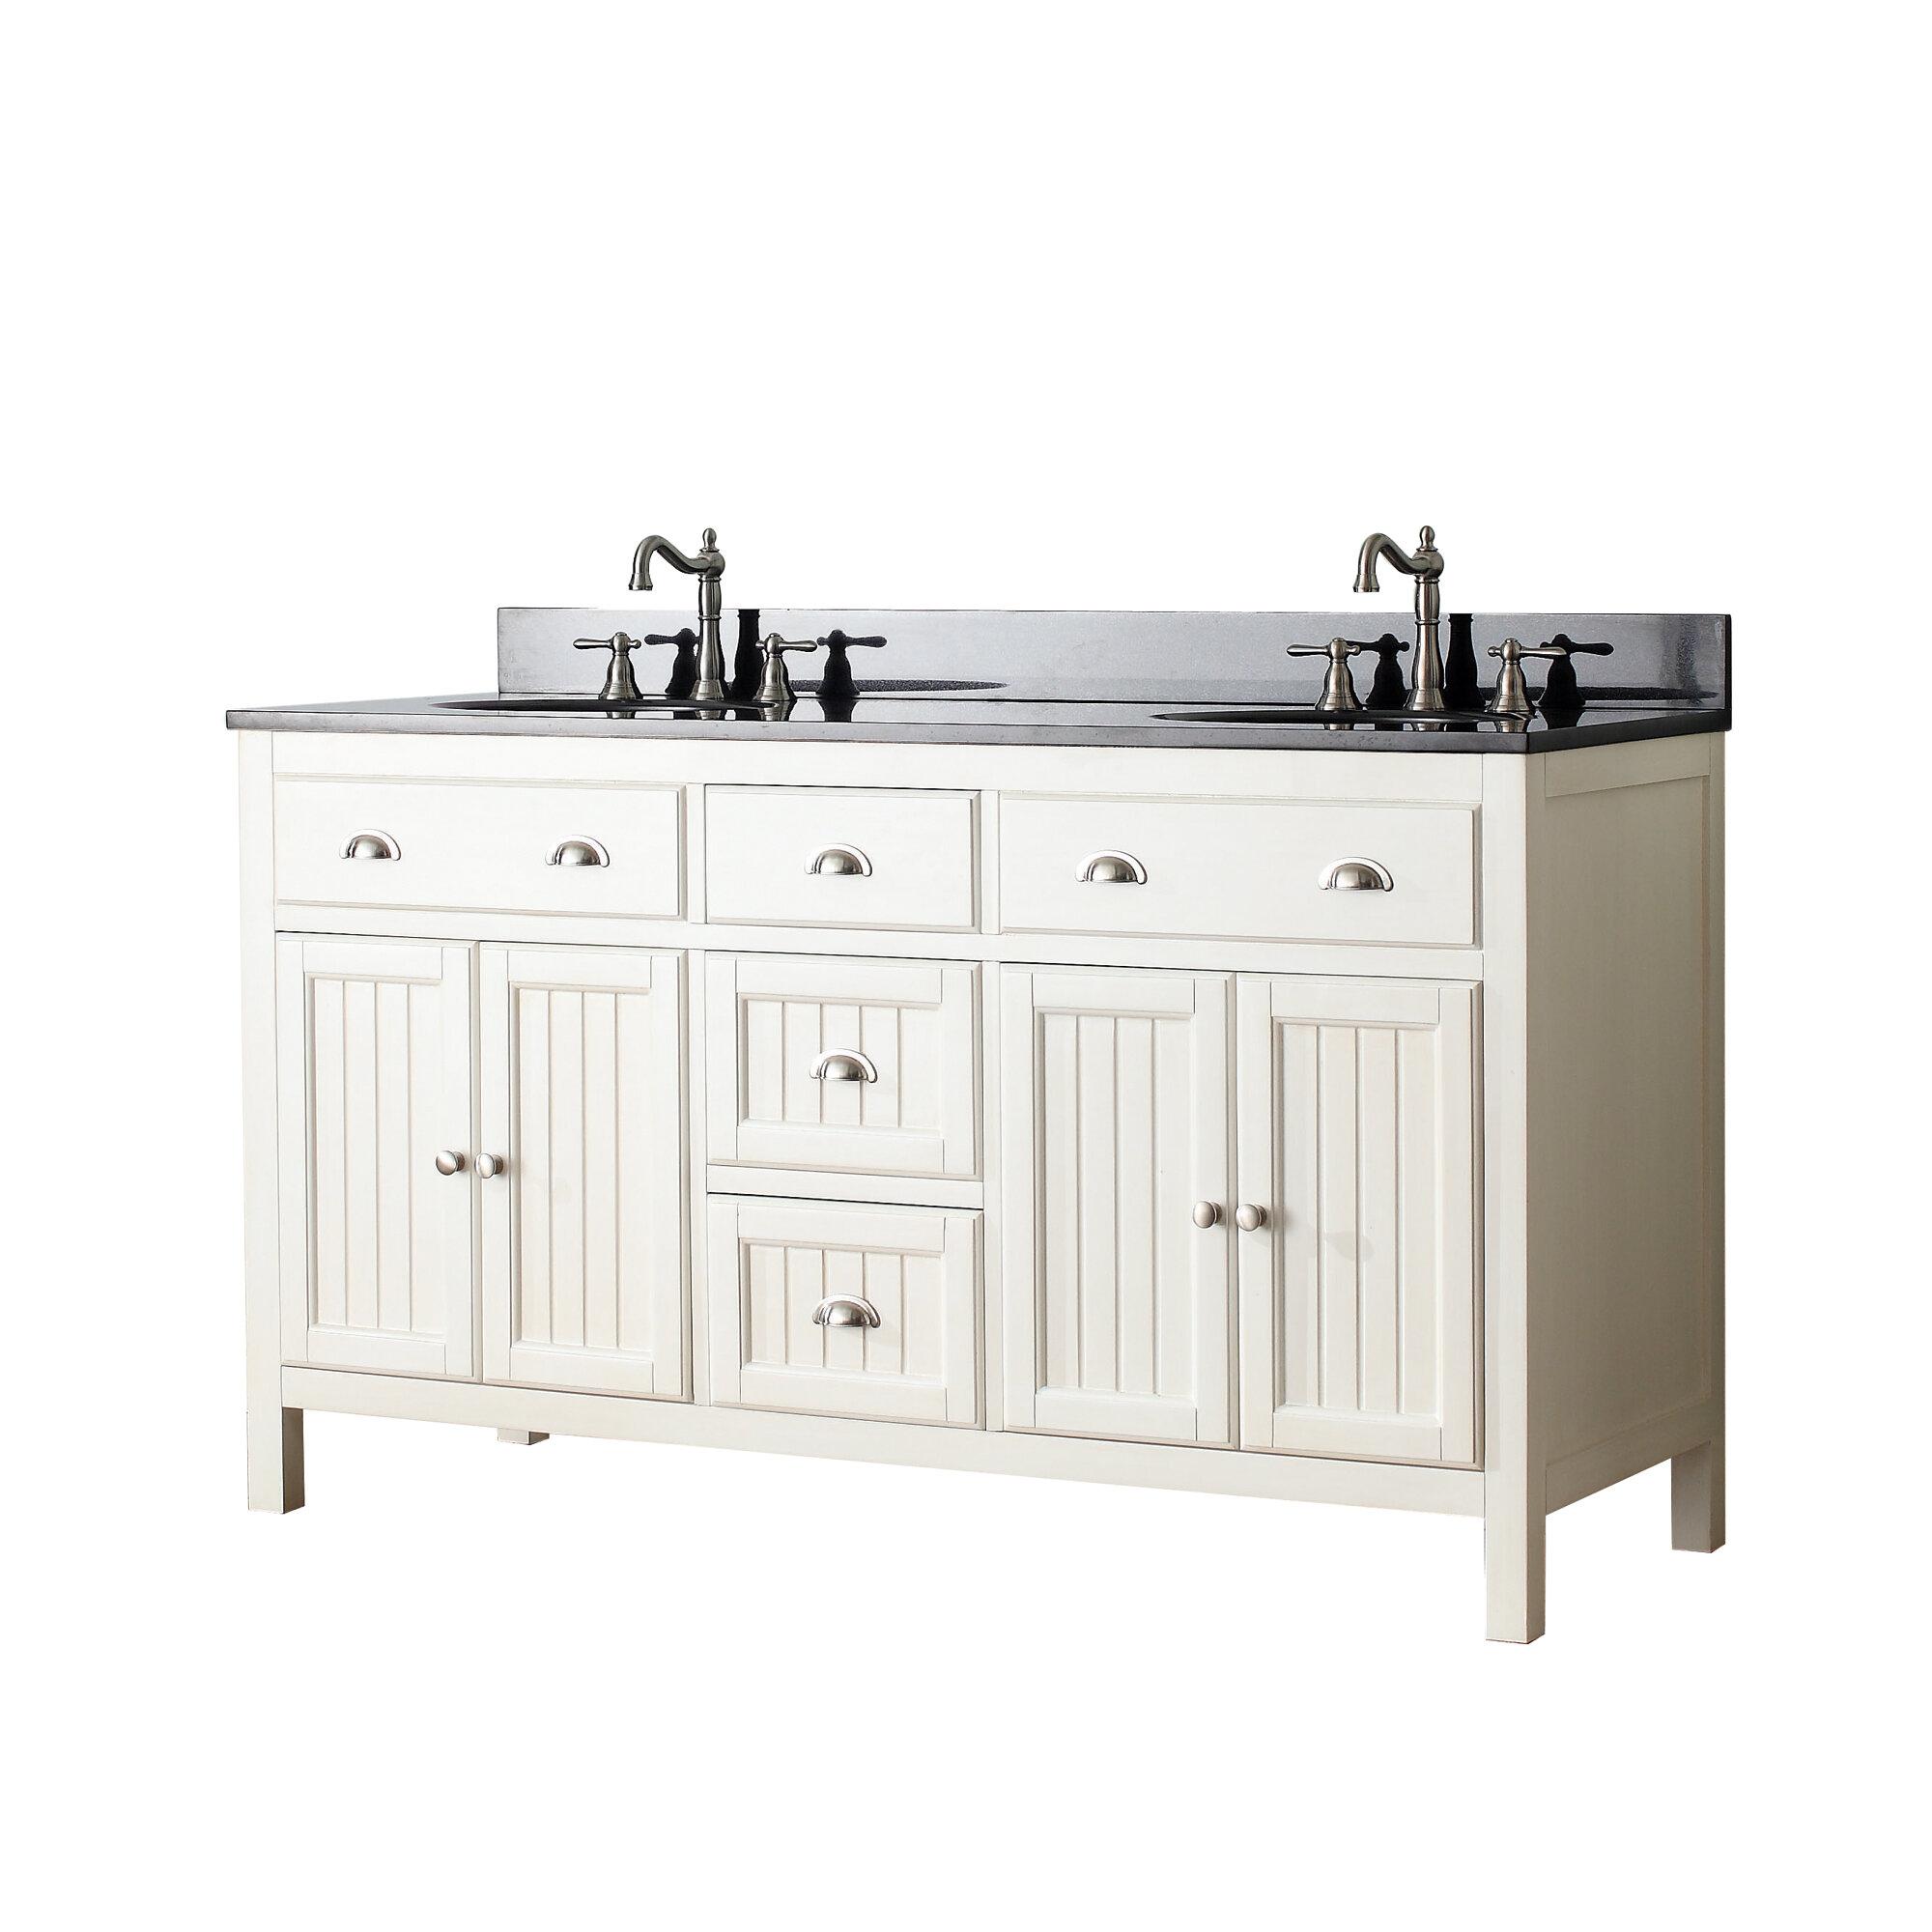 Avanity hamilton 61 double bathroom vanity set for Bathroom vanities hamilton